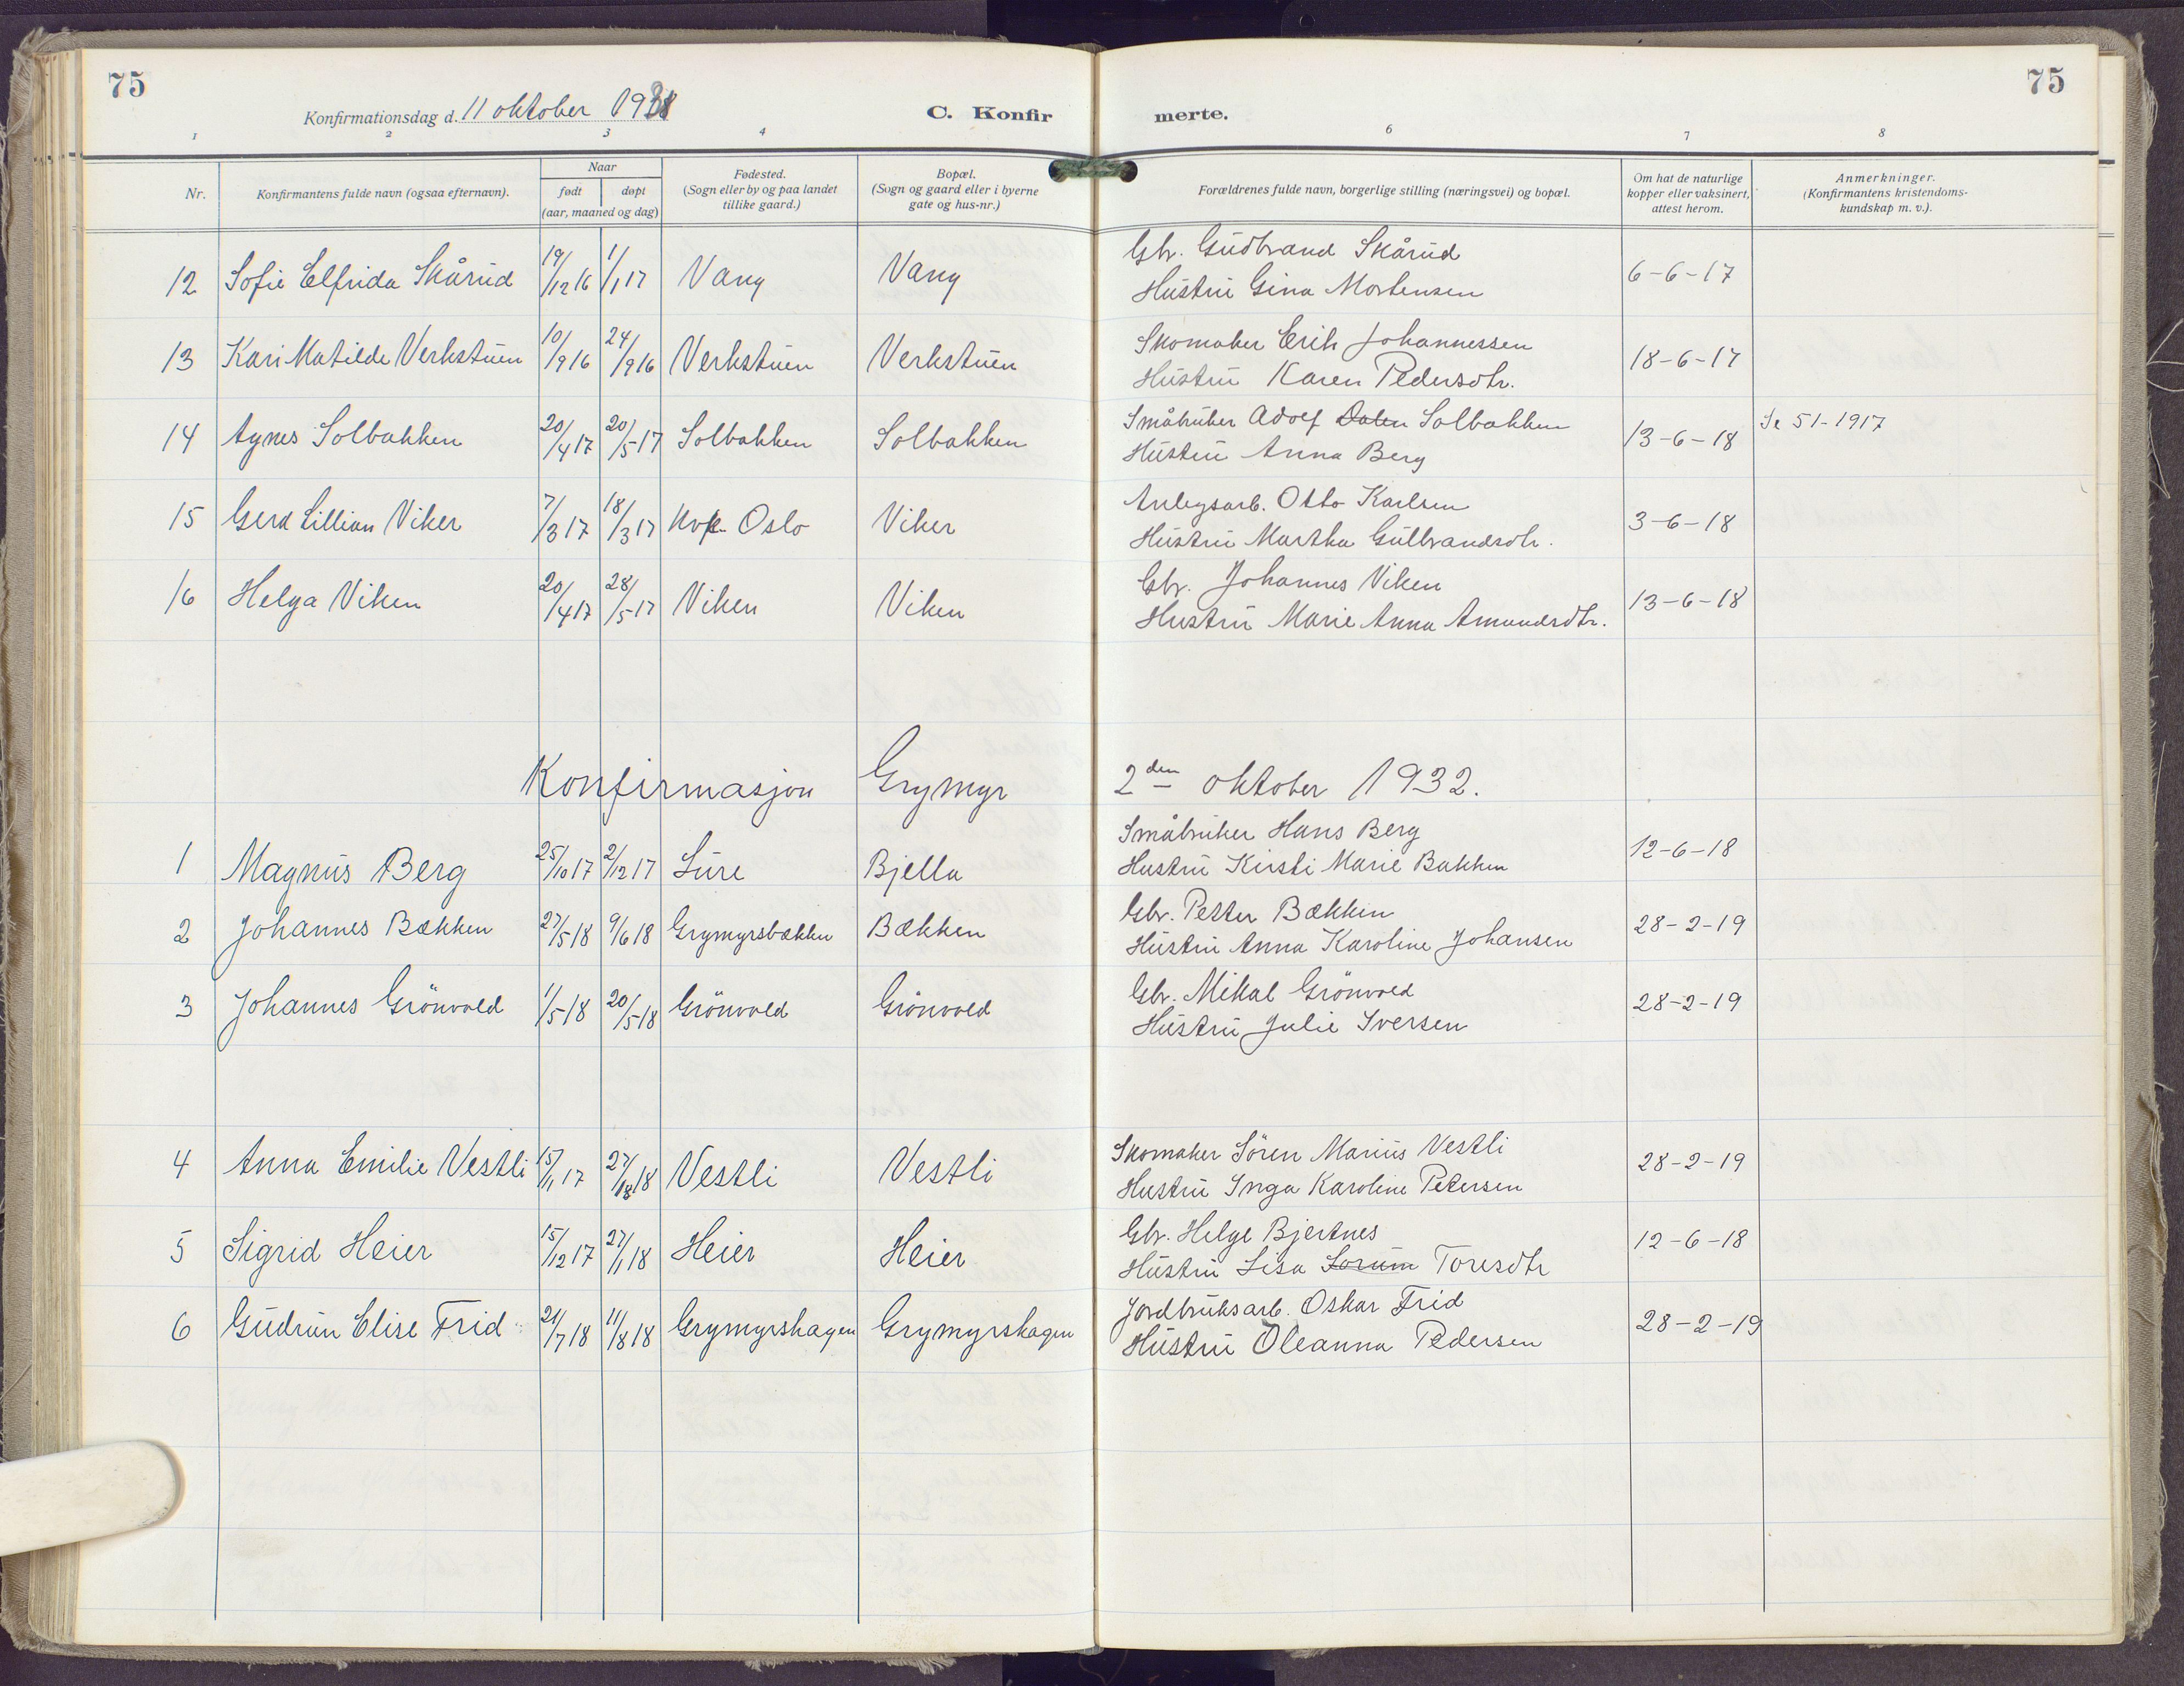 SAH, Gran prestekontor, Ministerialbok nr. 23, 1919-1938, s. 75